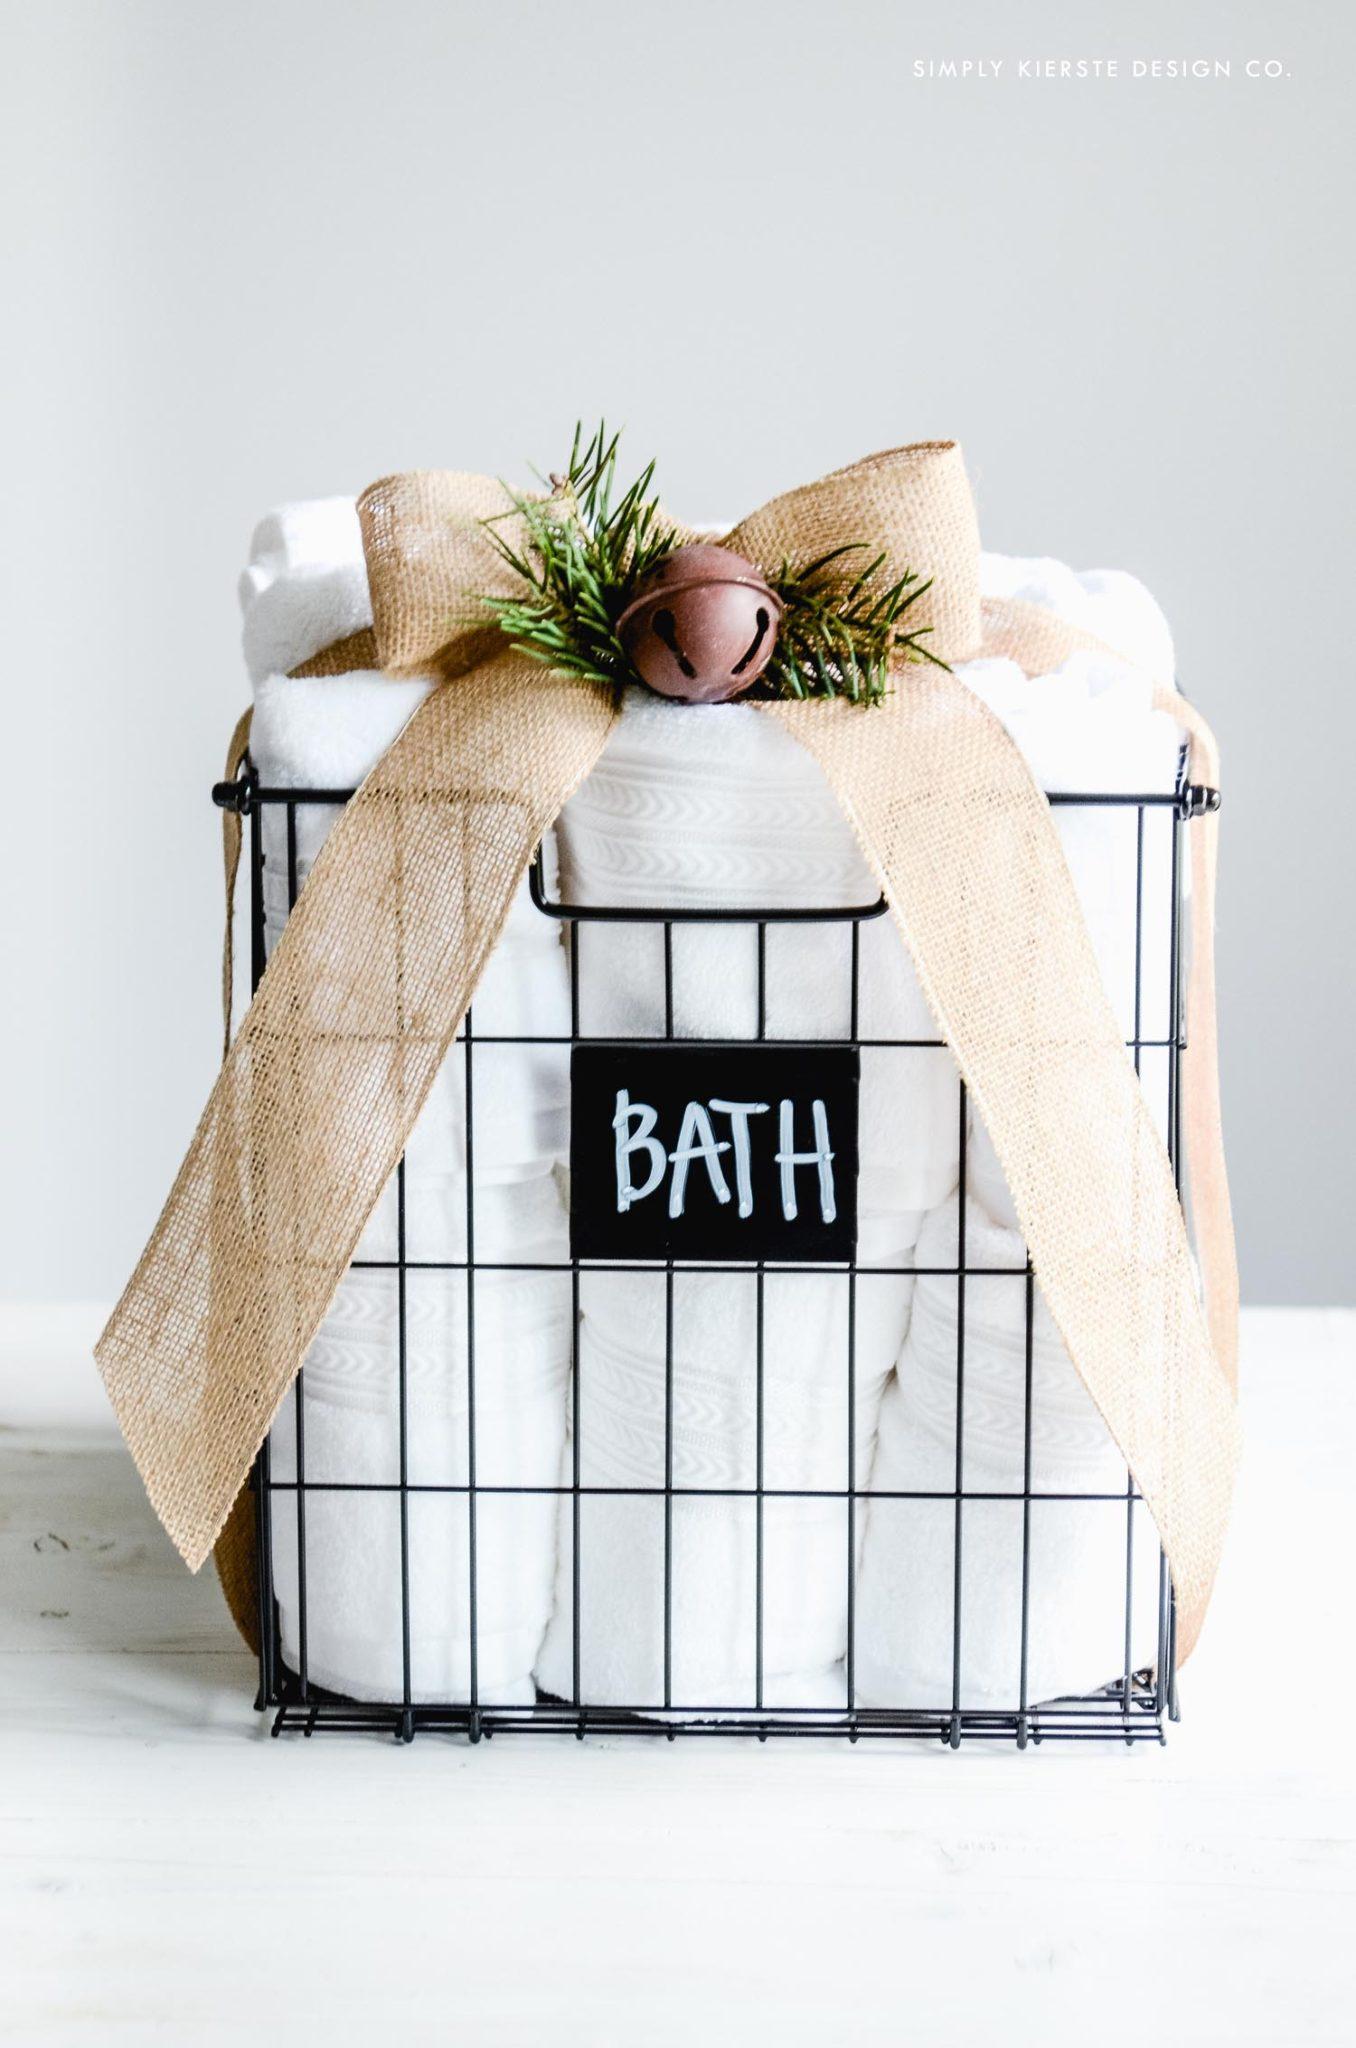 Affordable Gift Ideas | simplykierste.com #farmhousestyle #giftideasonabudget #easygiftideas